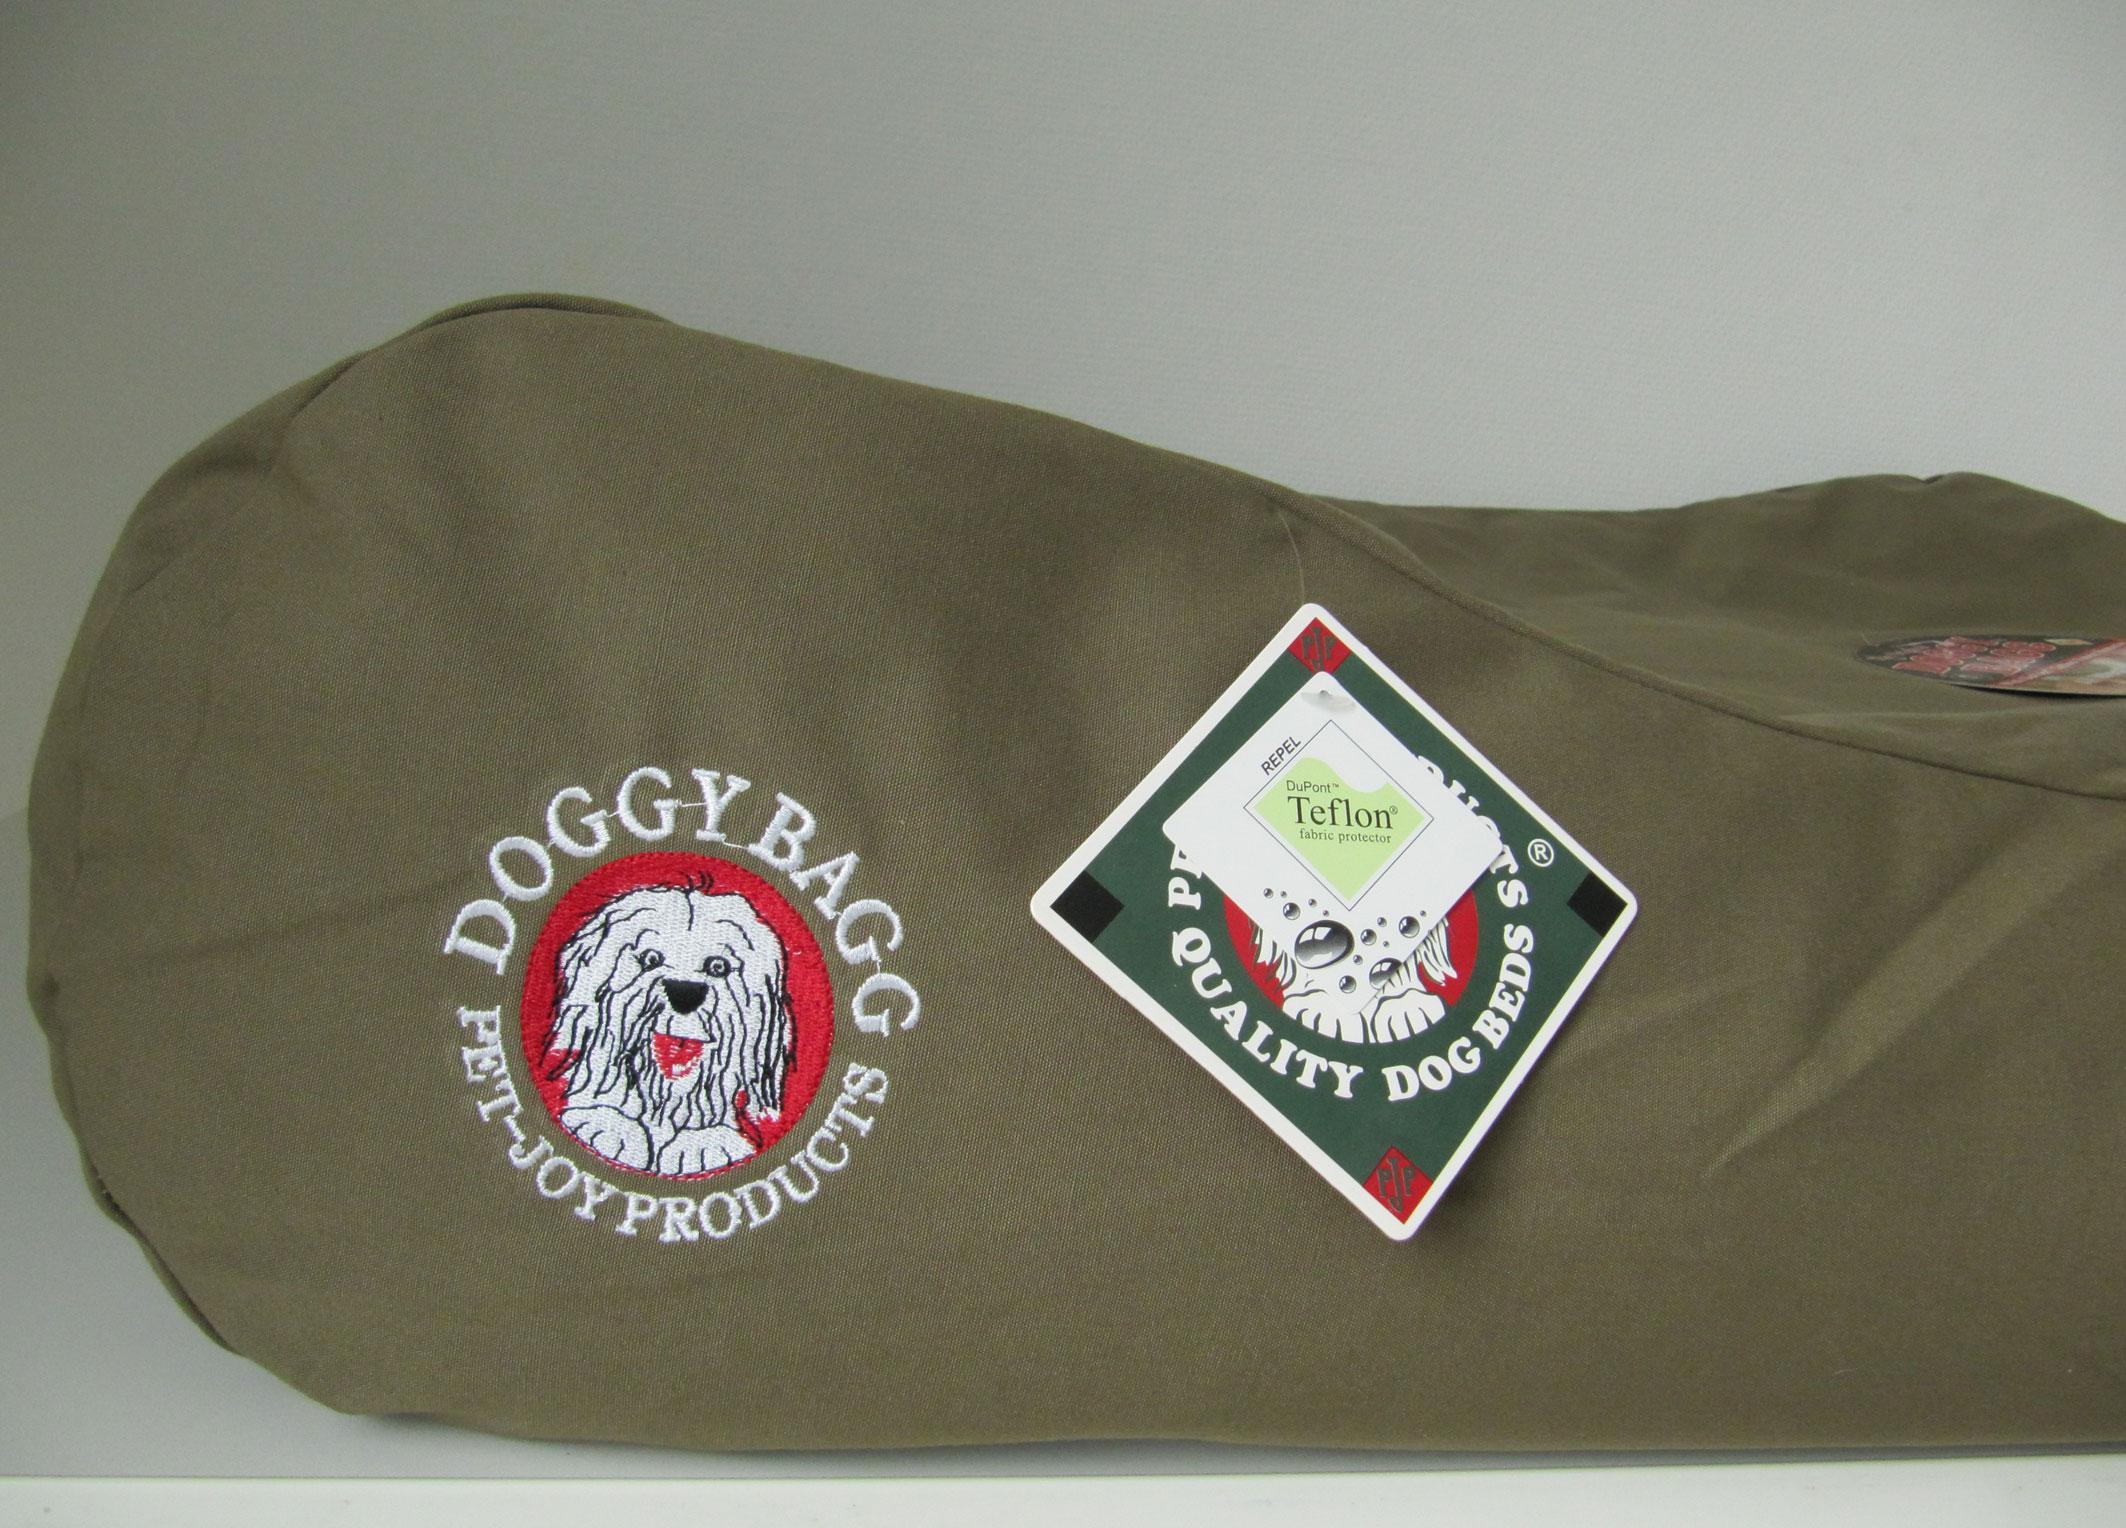 Hundebett / Hundekissen Doggy Bagg Original Gr.S Kangaroo / deep Camel Bild 2